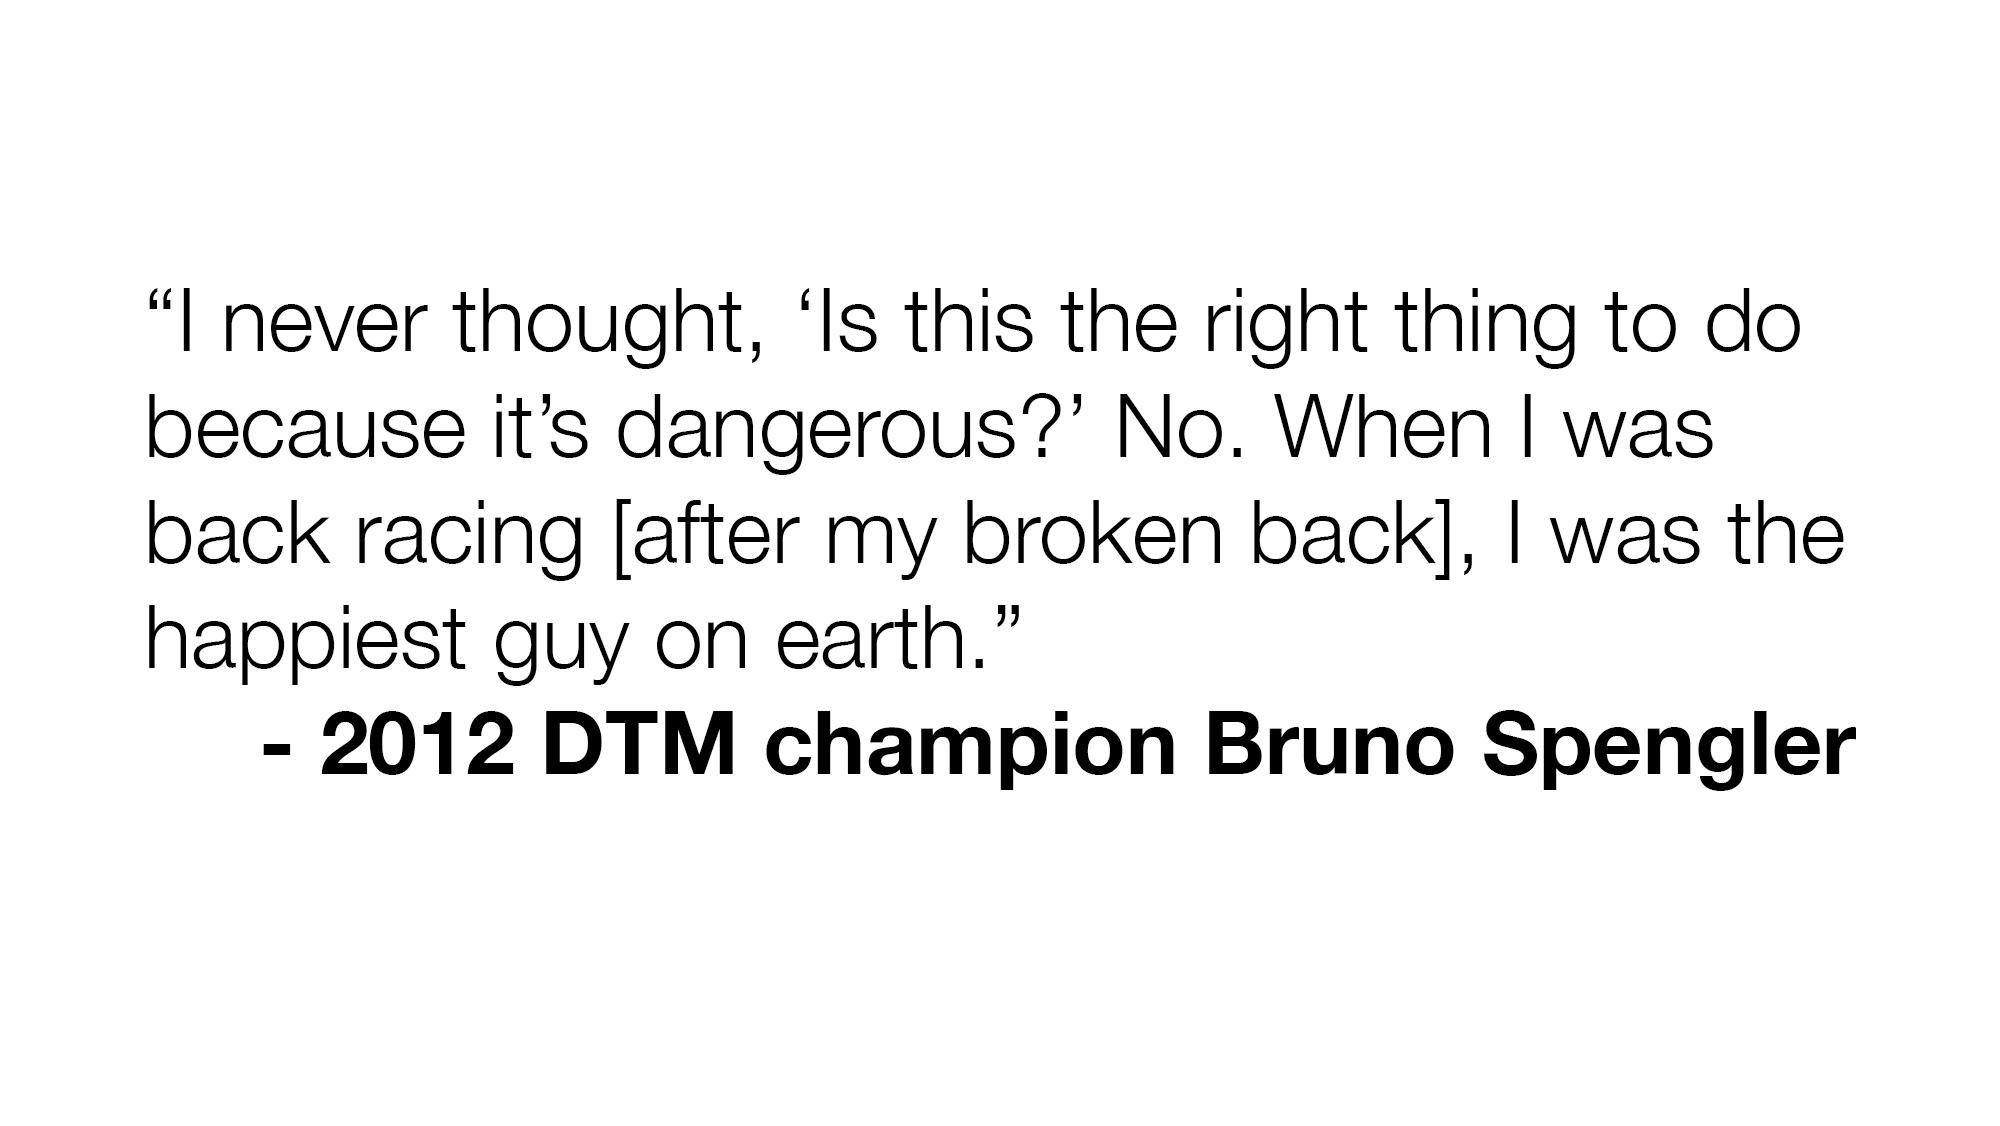 Bruno-Spengler-Quote.jpg